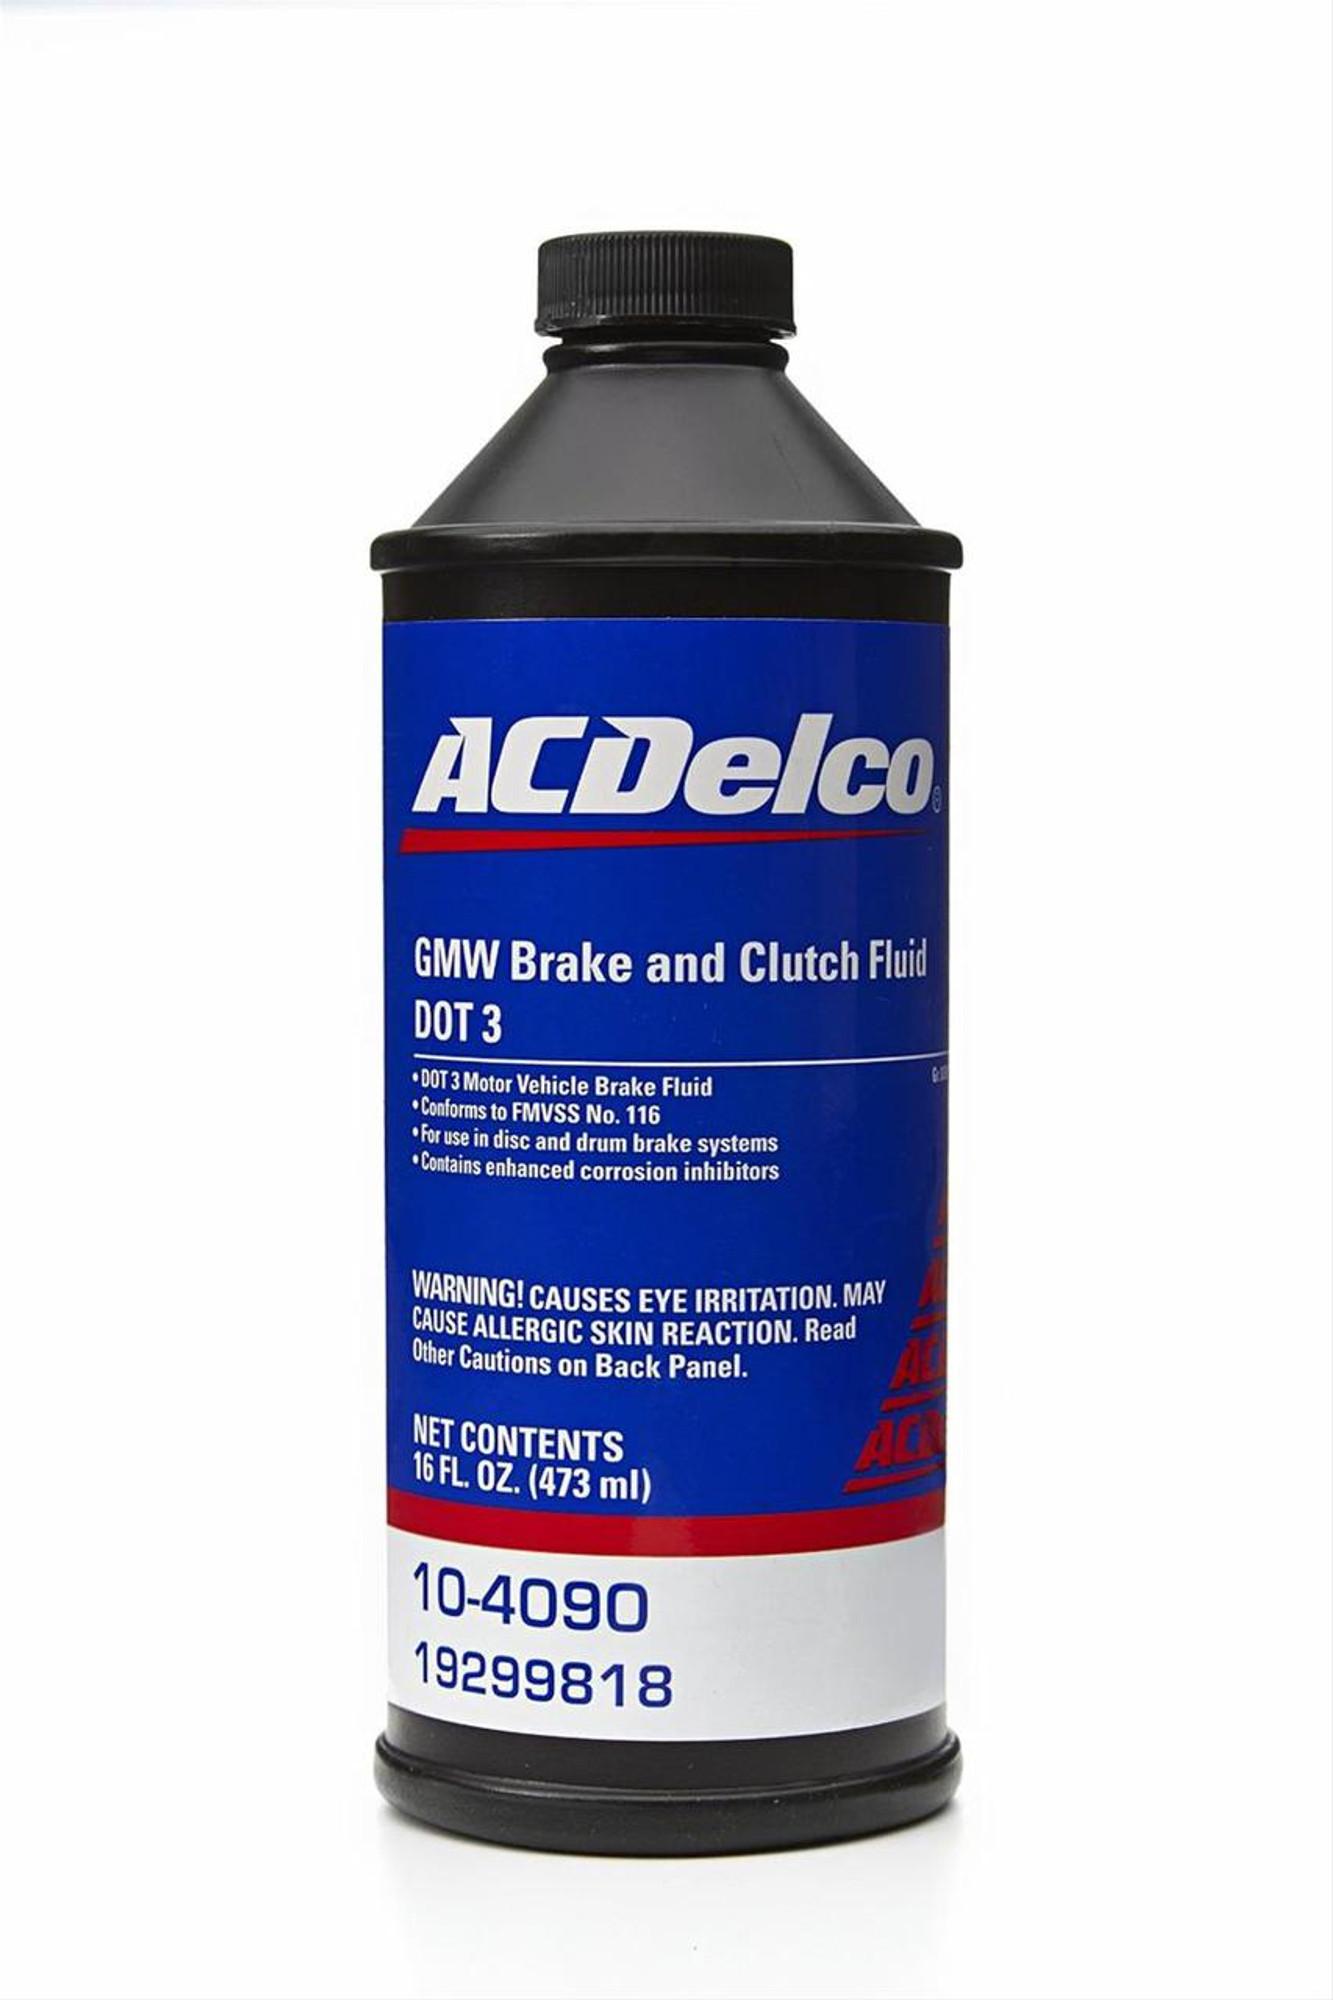 Gm Ac Delco Dot 4 Brake Clutch Fluid 8oz Tick